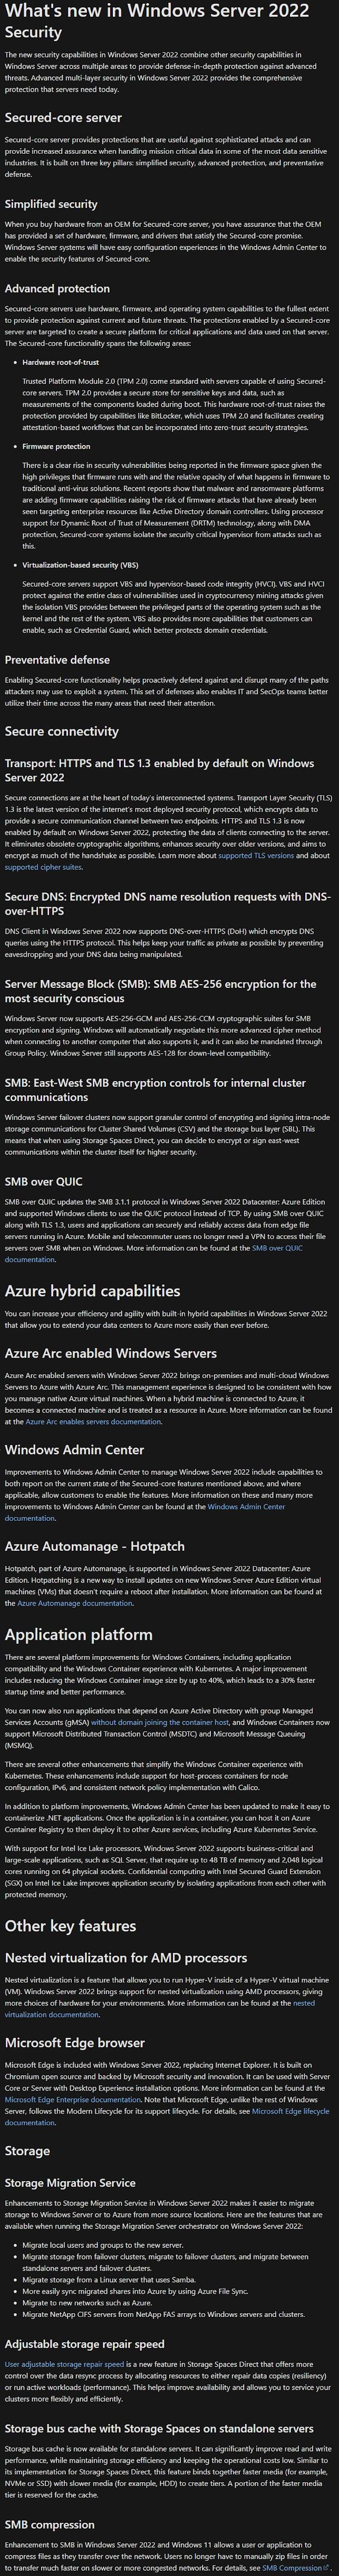 Windows Server 2022 Features